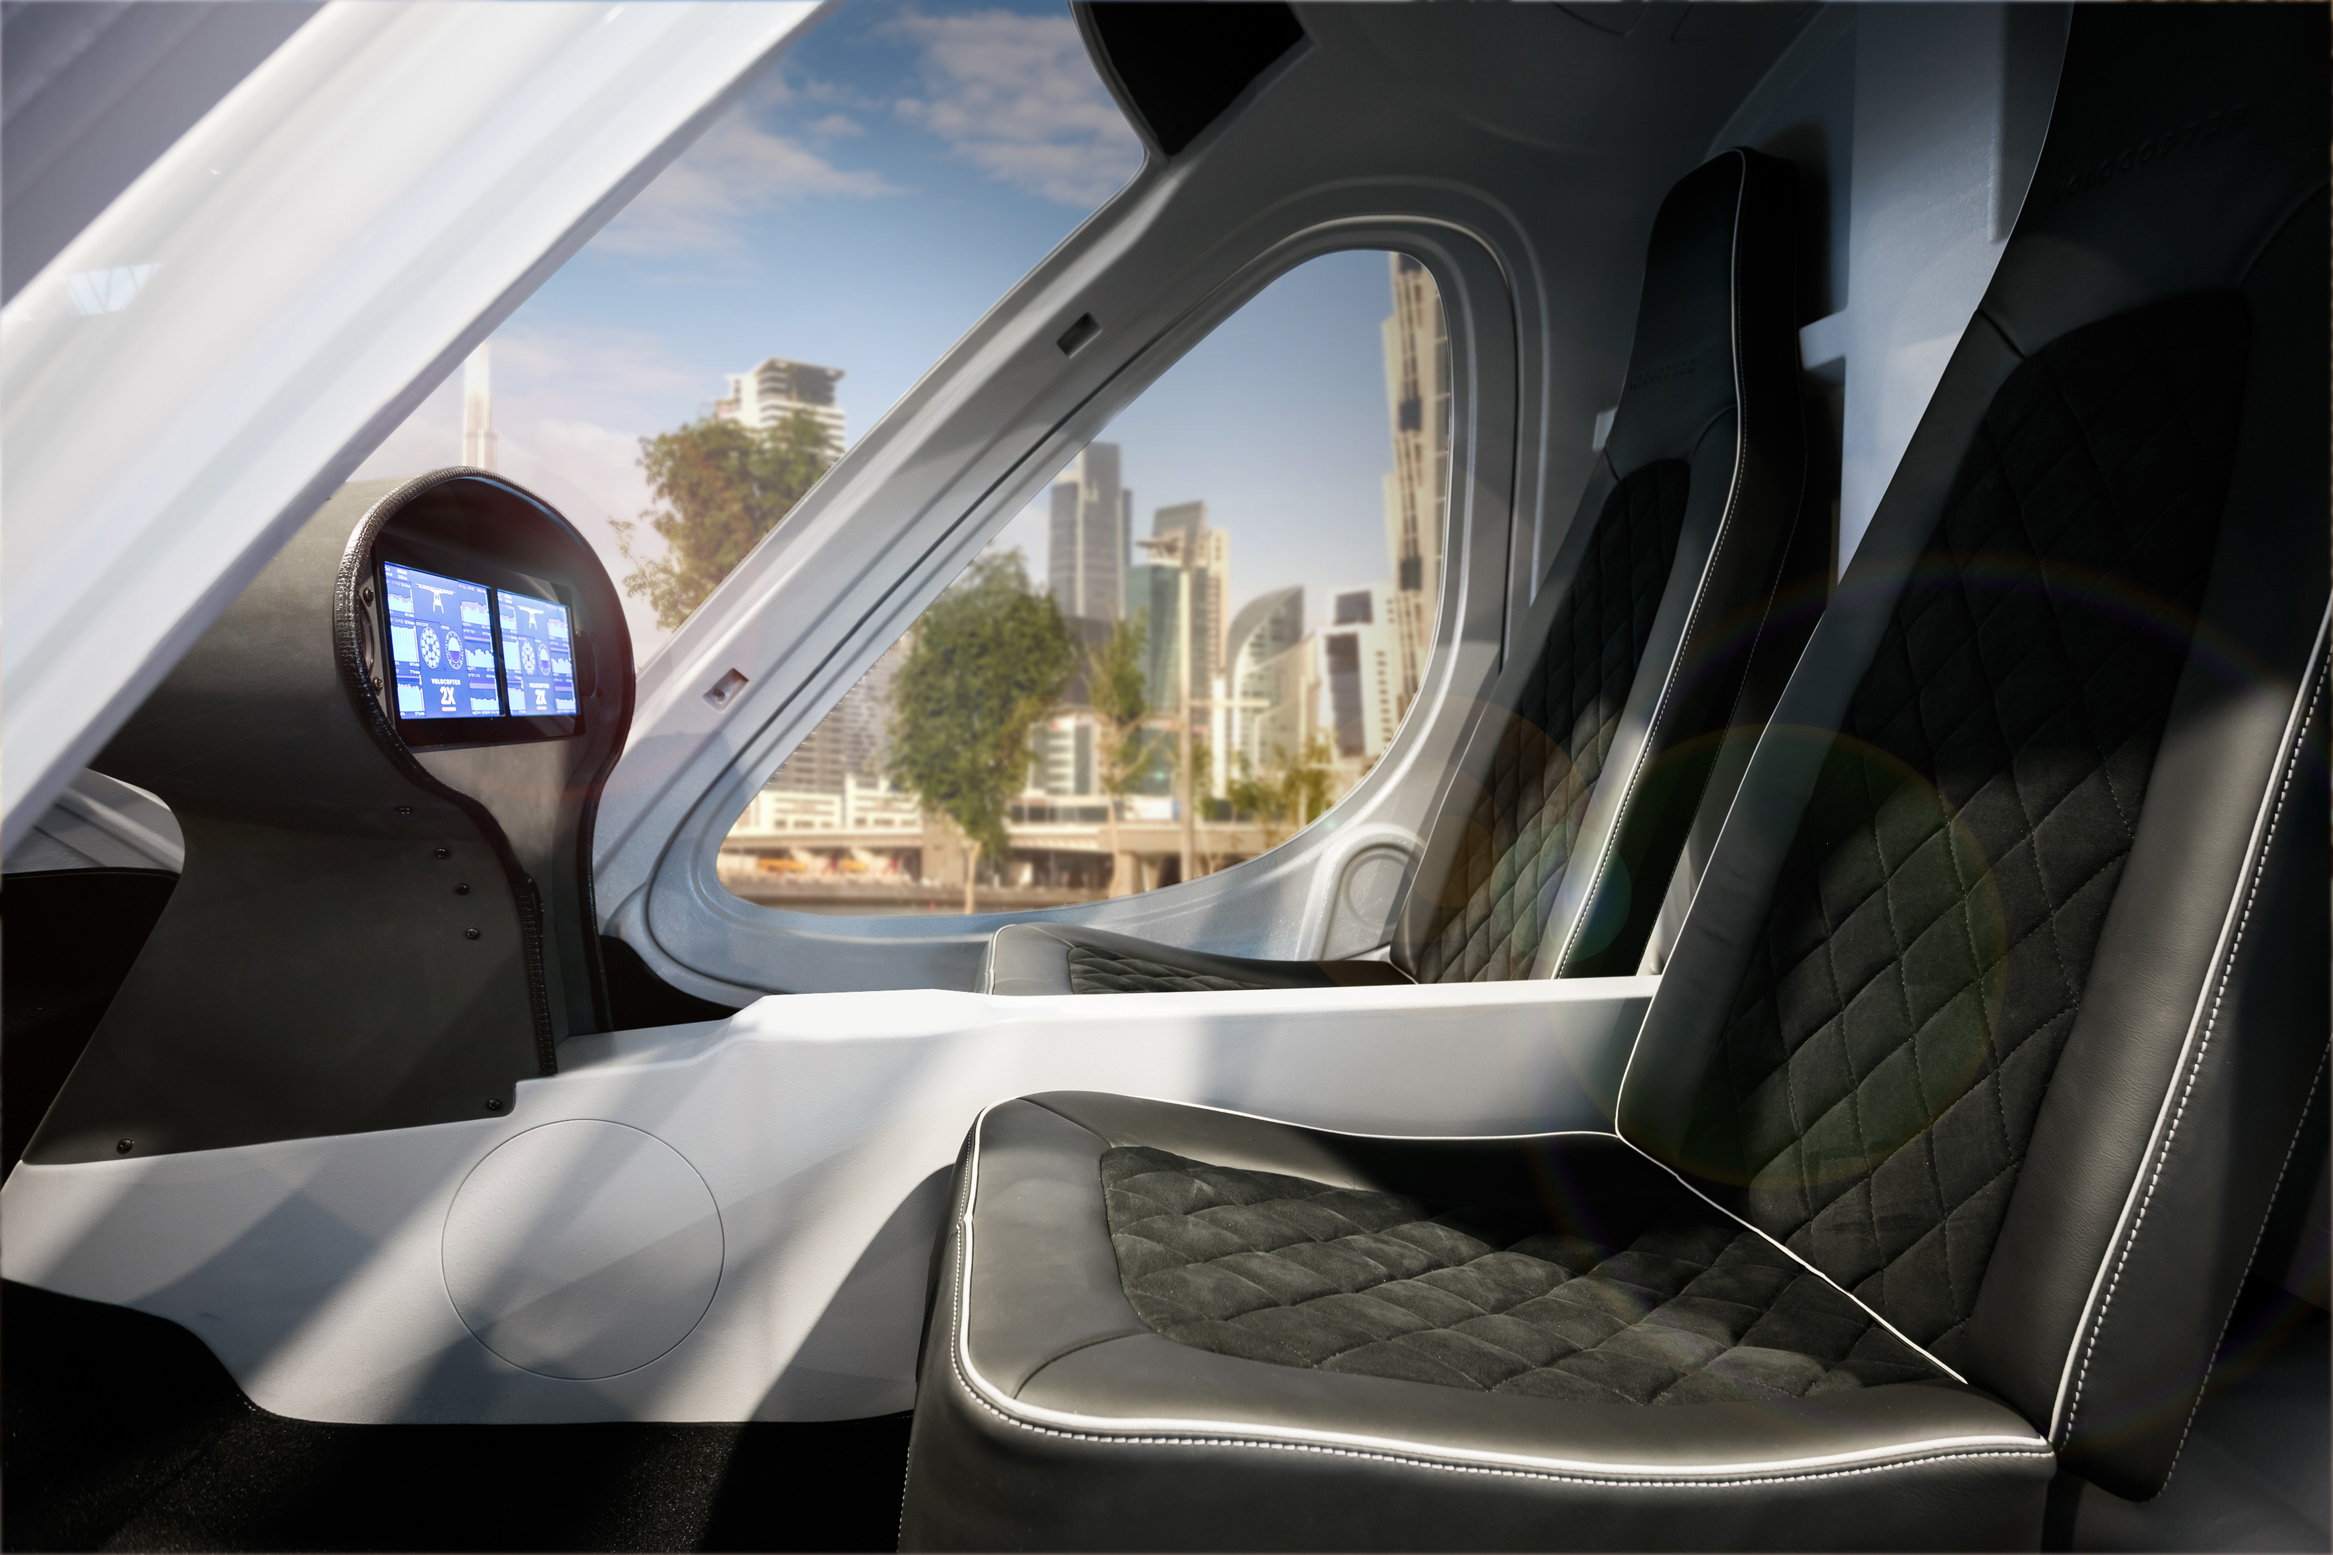 Volocopter 2X Air Taxi helicopter Dubai autonomous